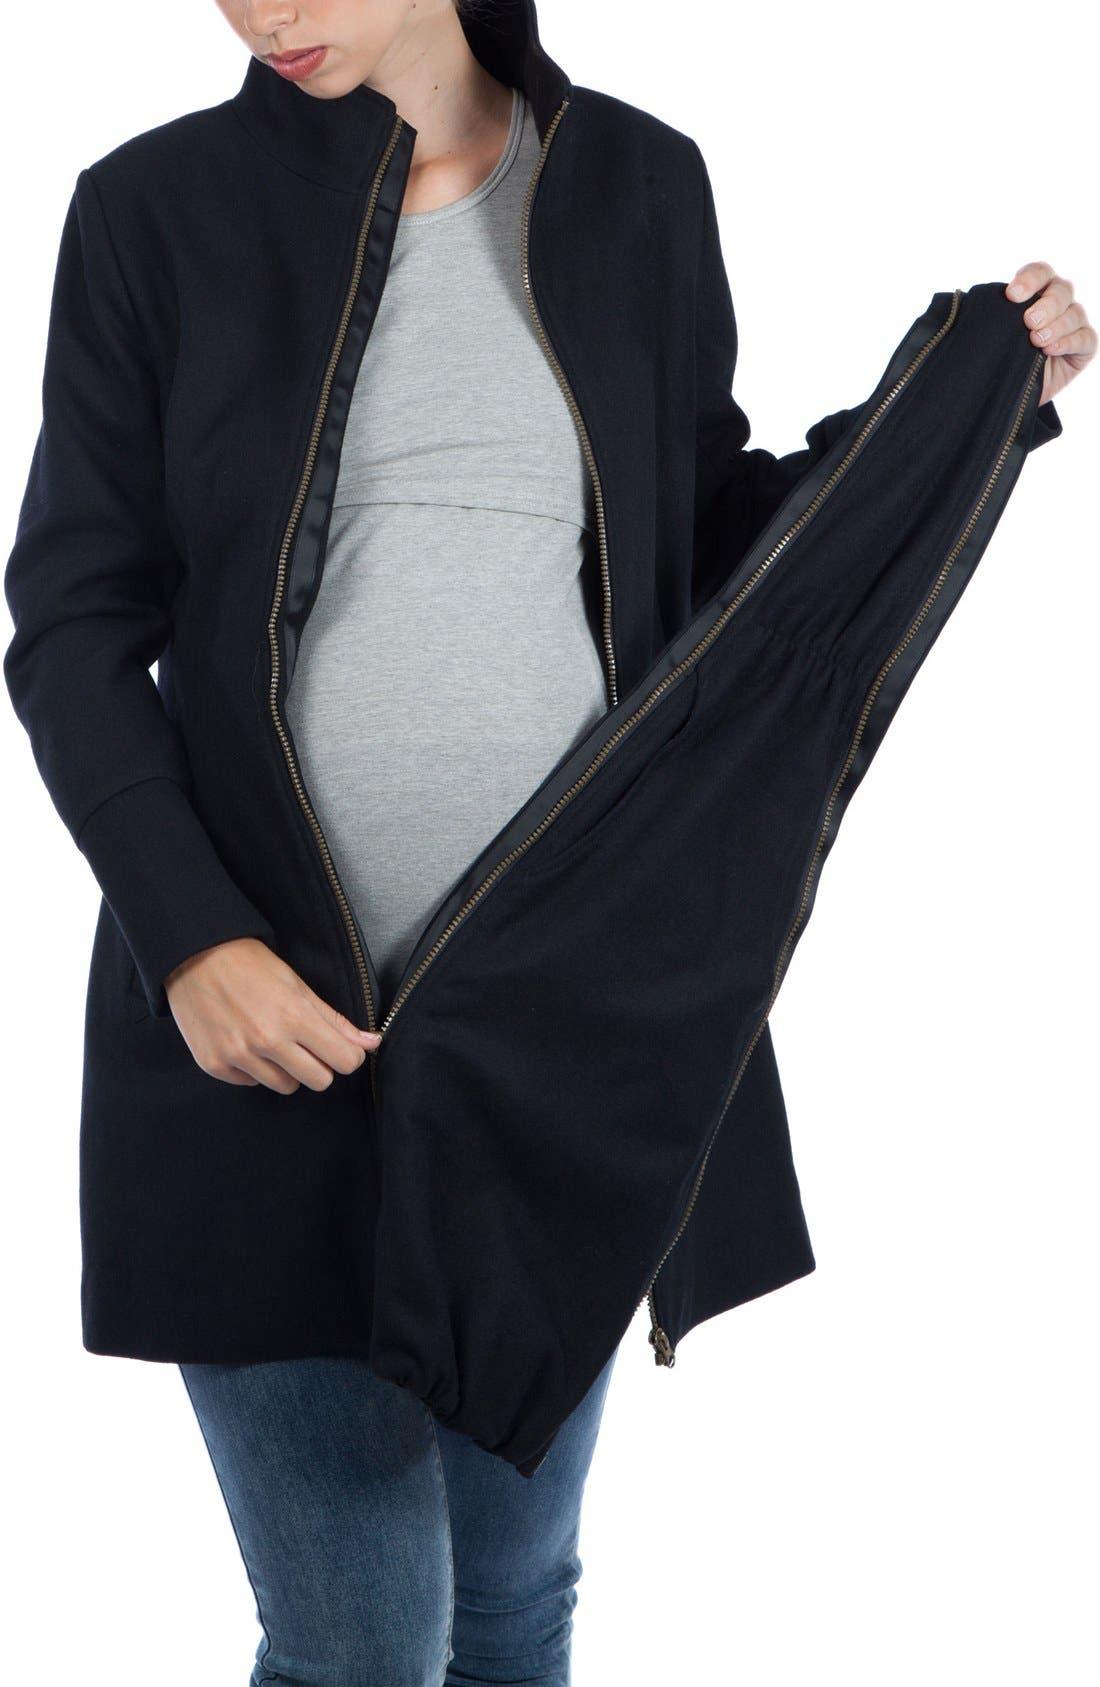 Convertible 3-in-1 Maternity/Nursing Coat,                             Alternate thumbnail 12, color,                             BLACK